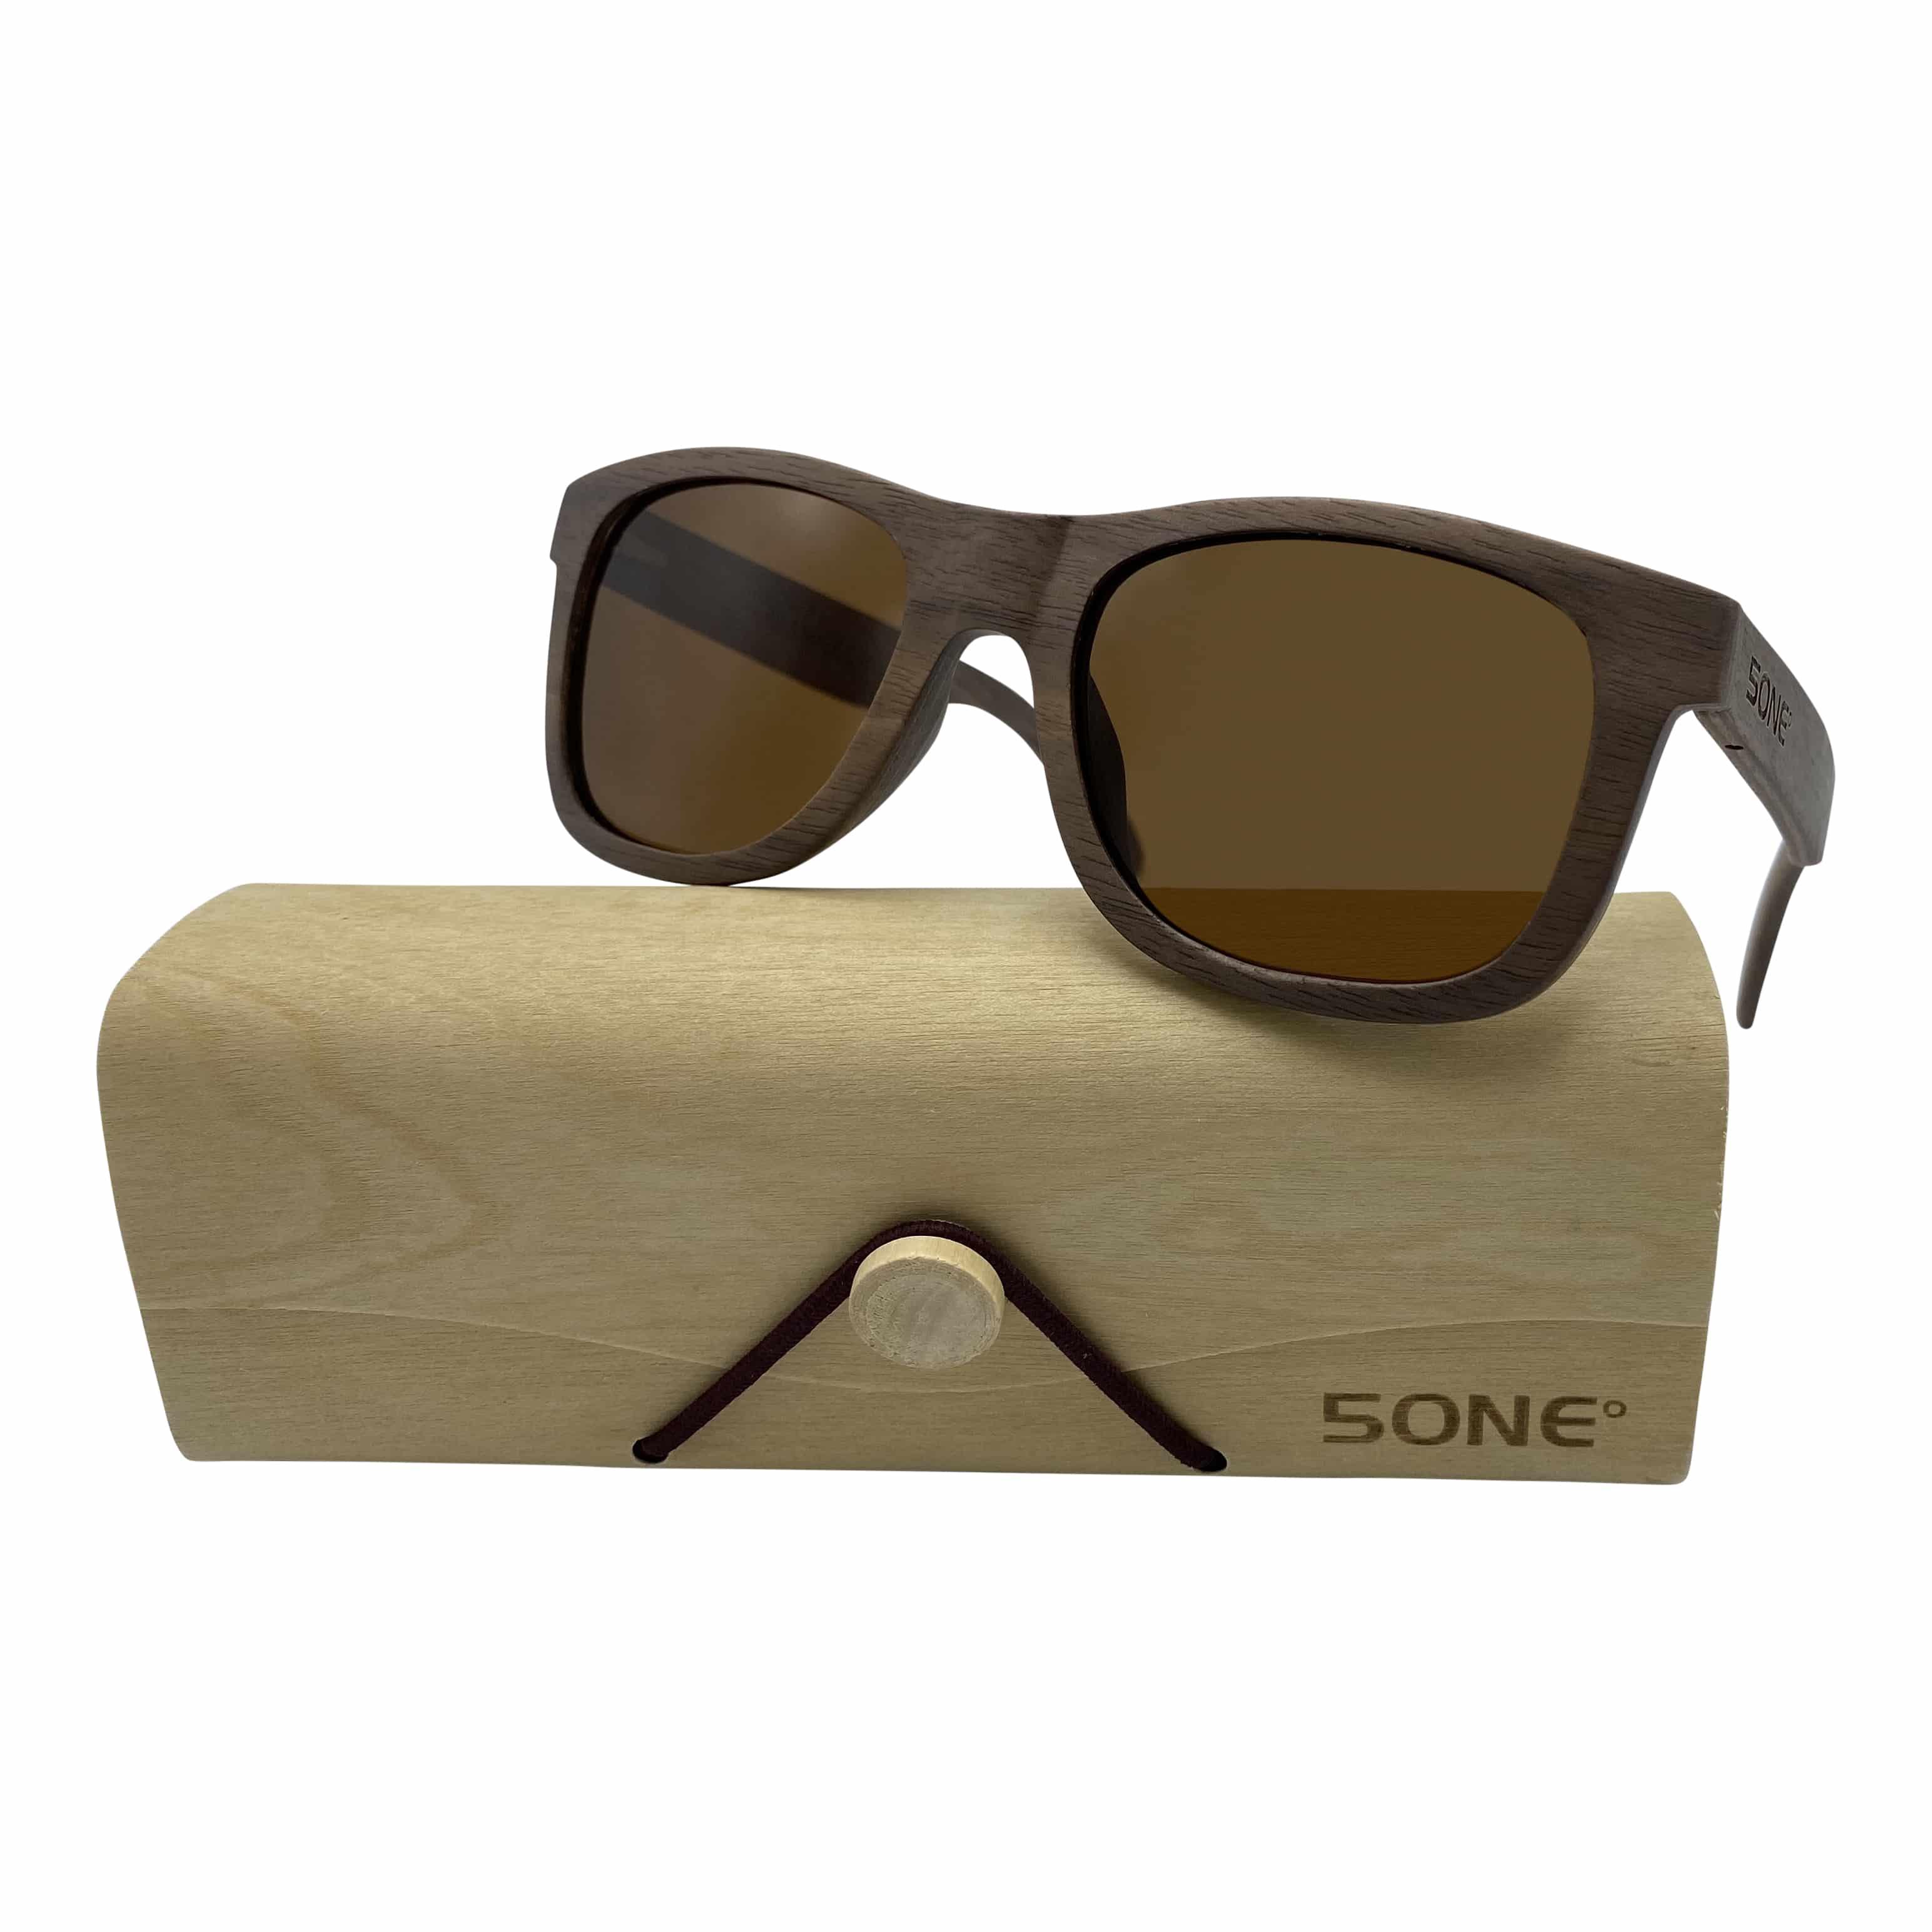 5one® wayfarer 2.0 walnut brown - Walnoot houten Zonnebril - Bruin